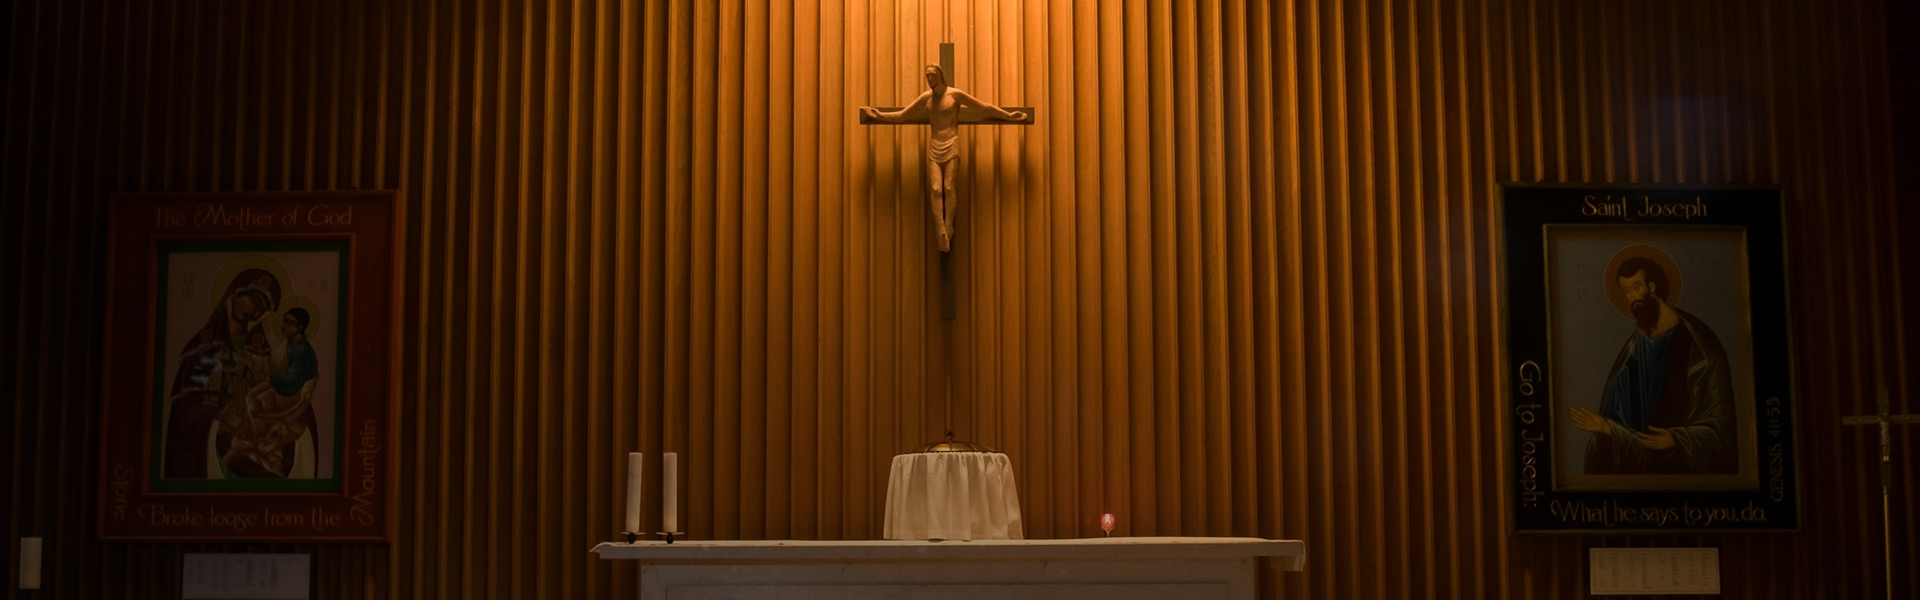 Liturgy & Spirituality - Regis College